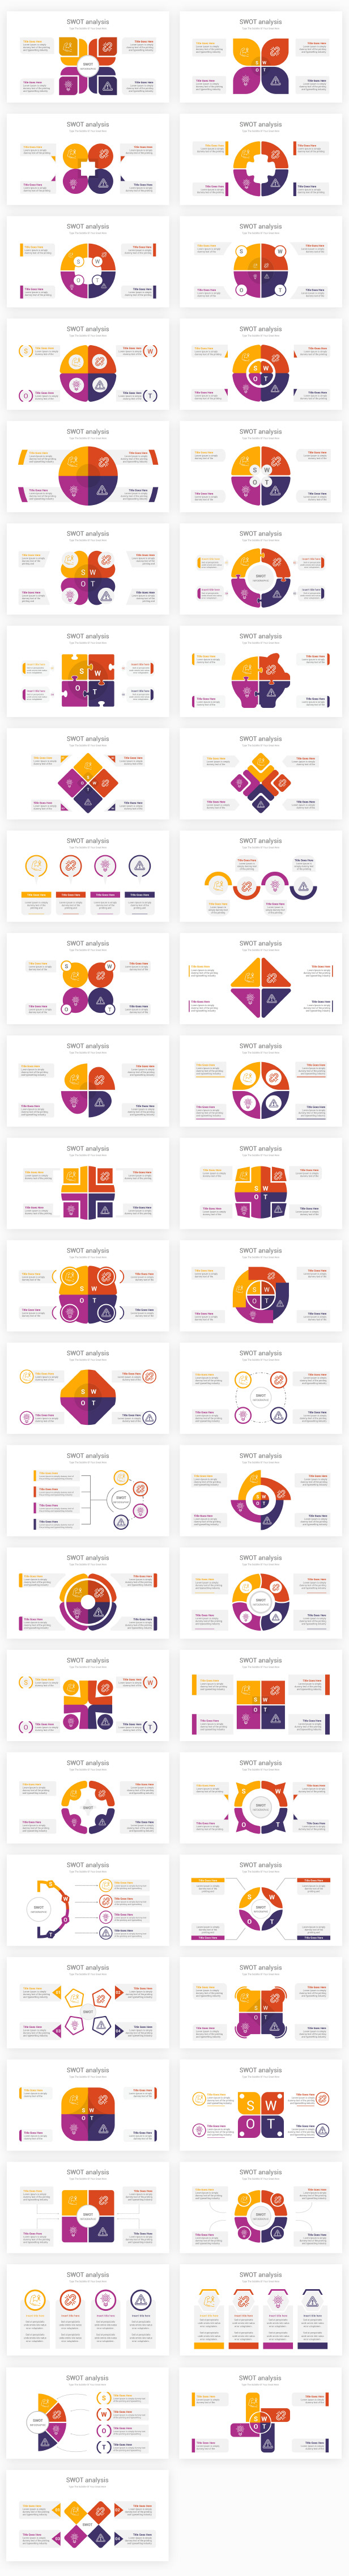 SWOT analysis PowerPoint & Illustrator Template